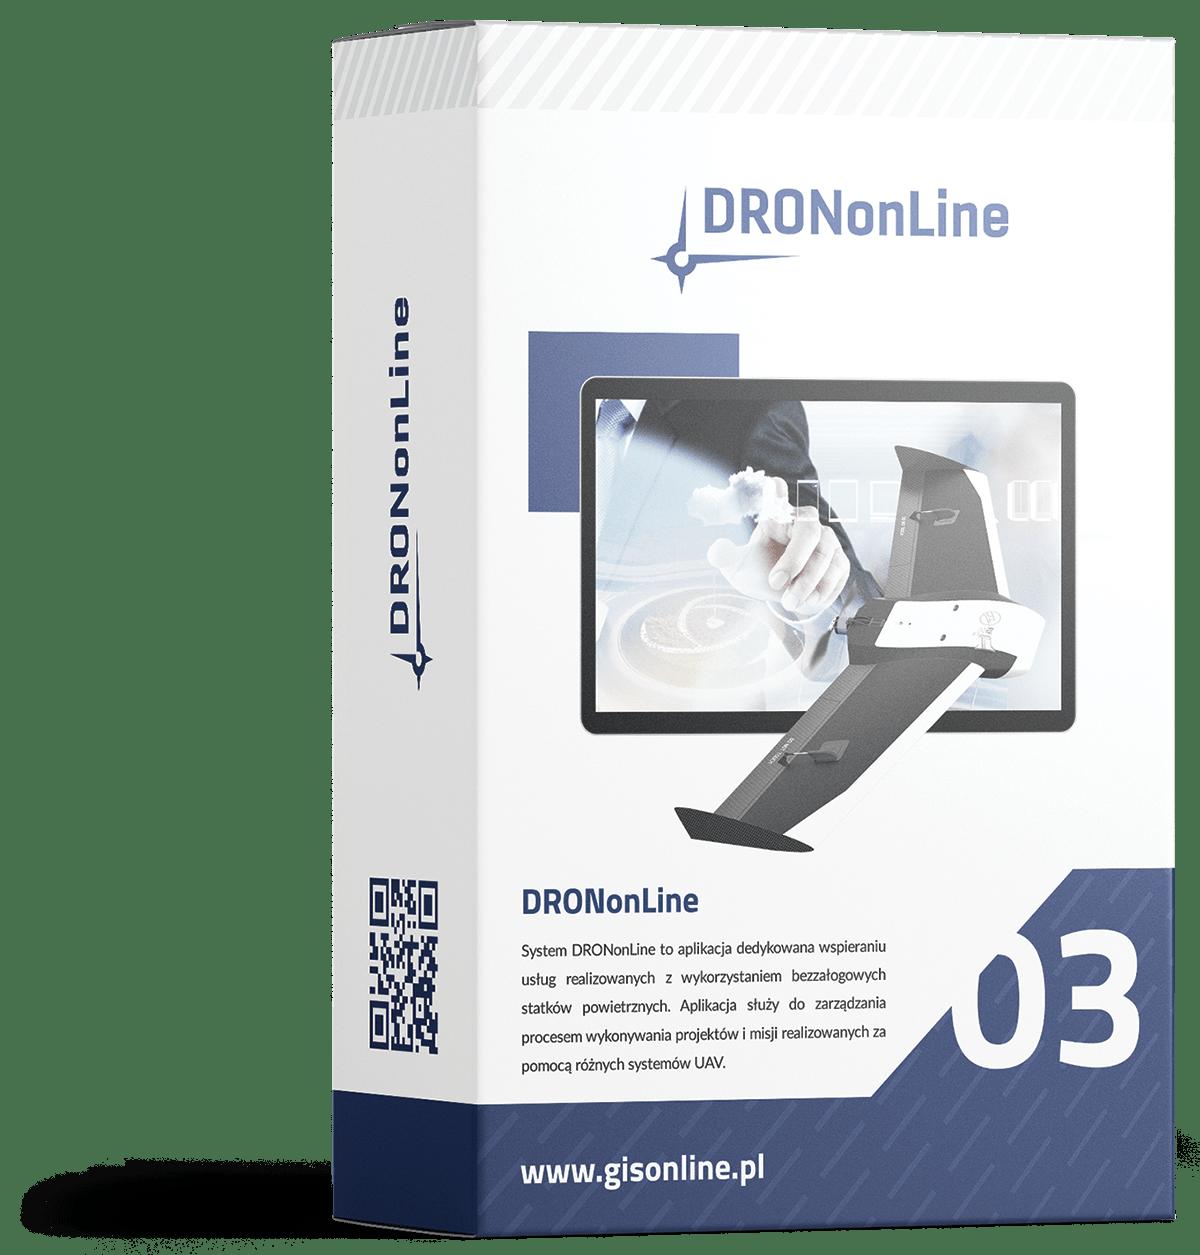 DRONonLine